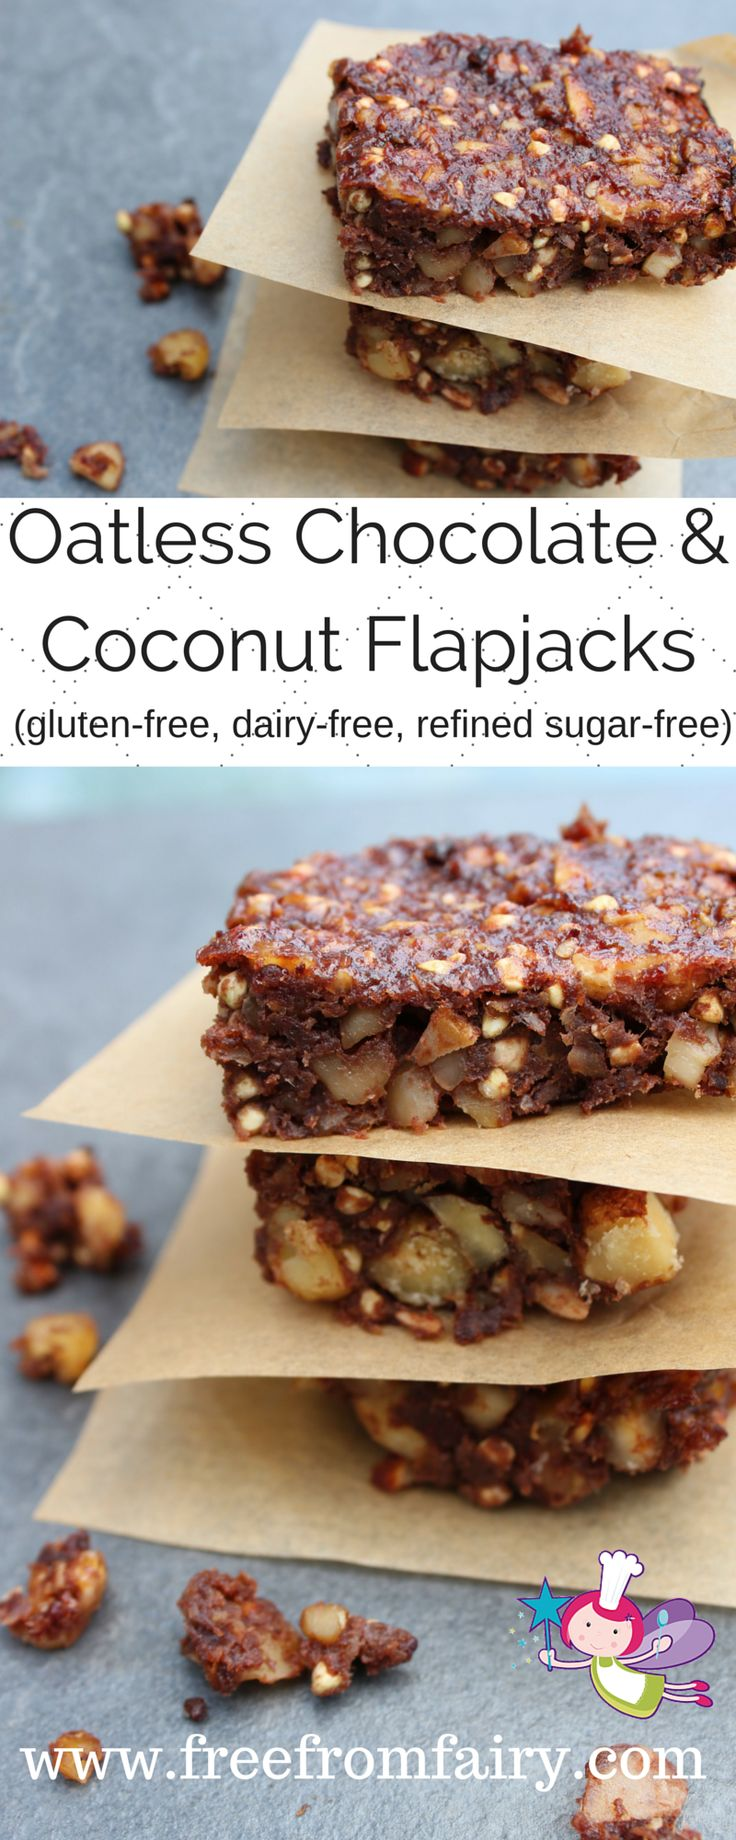 Gluten-free dairy-free egg-free soya-free refined sugar-free easy peasy oatless flapjacks!